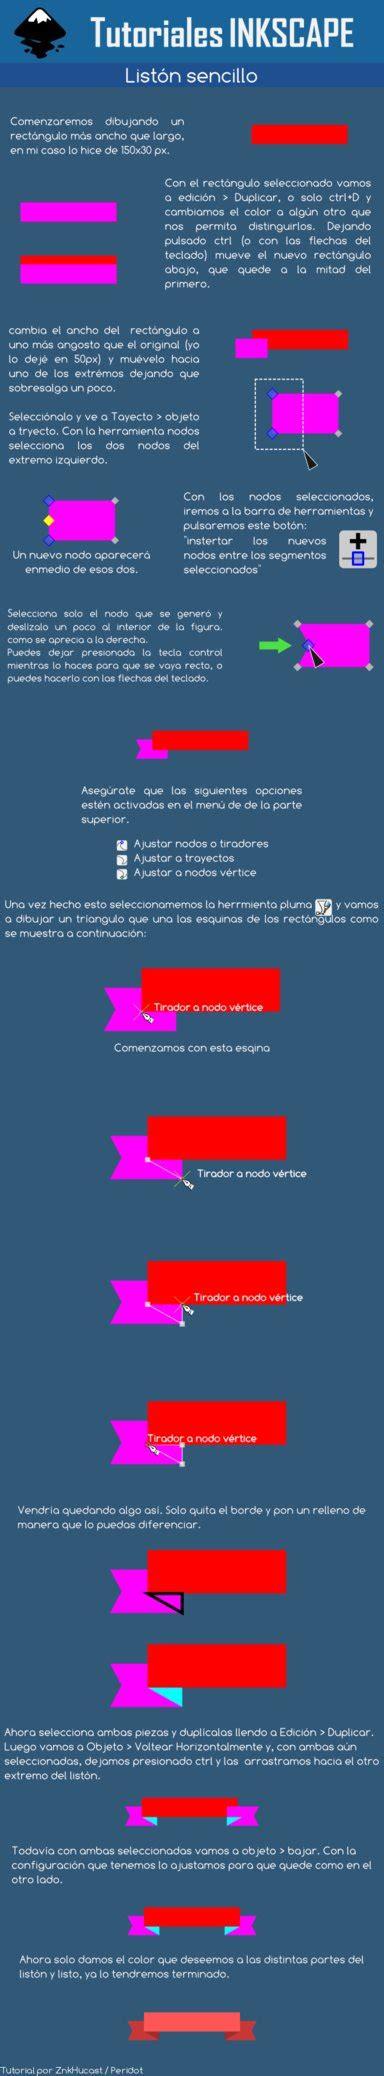 tutorial inkscape vetorização tutorial how to use inkscape and illustrator on drawing